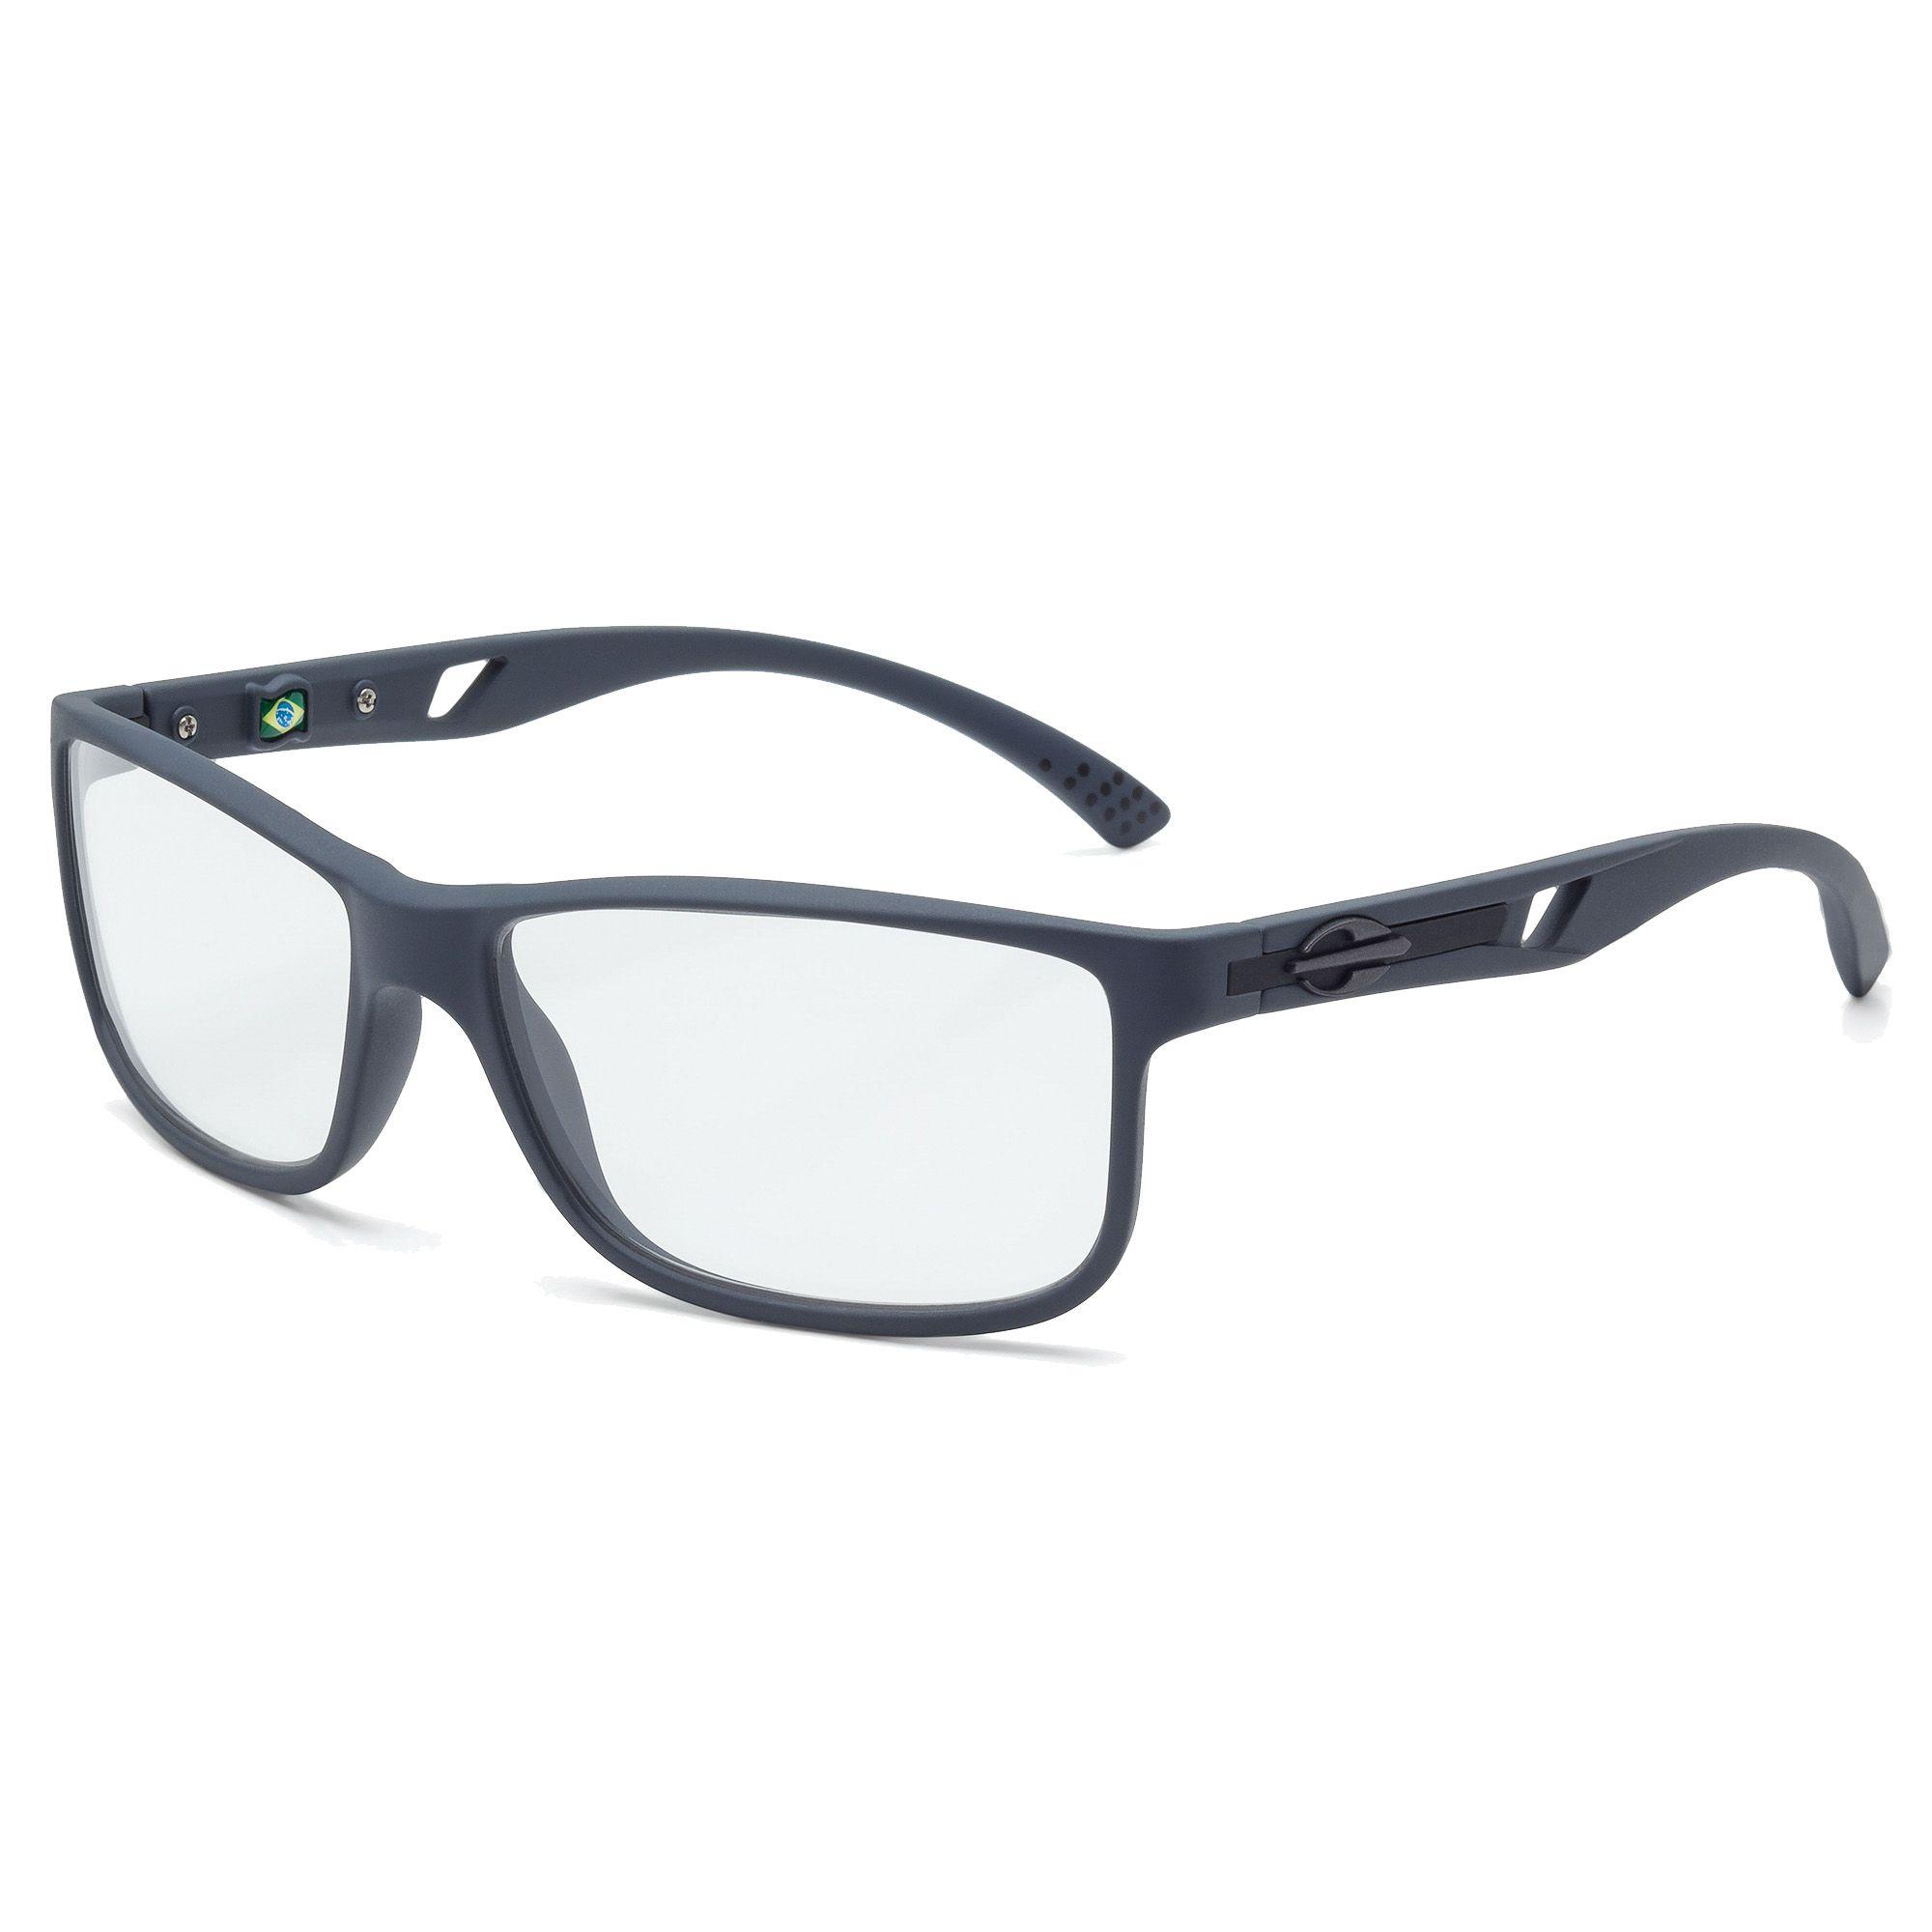 Óculos de Grau Masculino Mormaii Atlantico M6007D8457